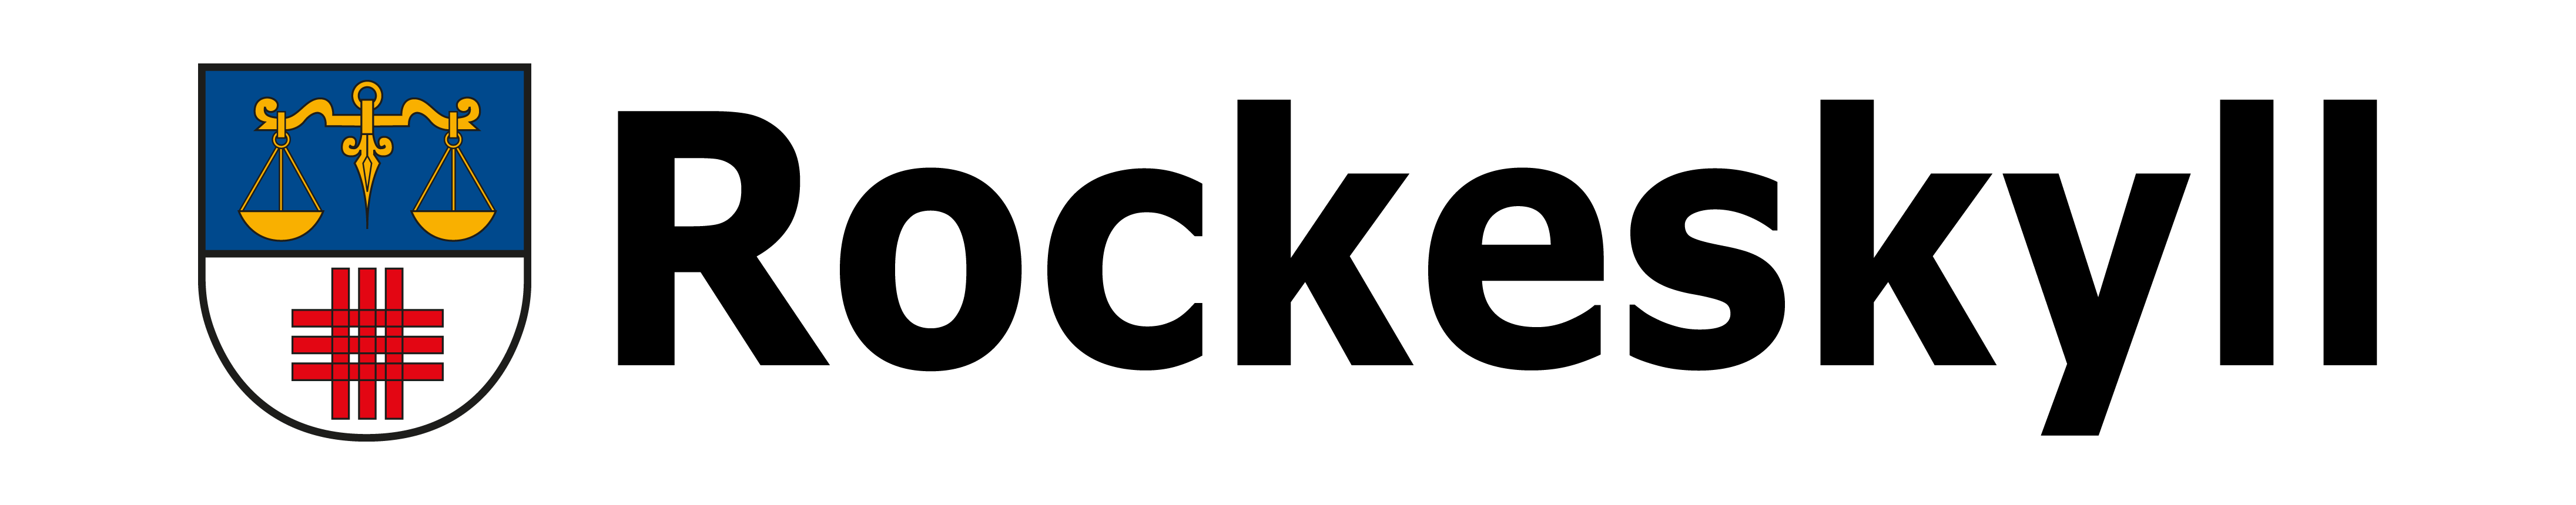 p544241